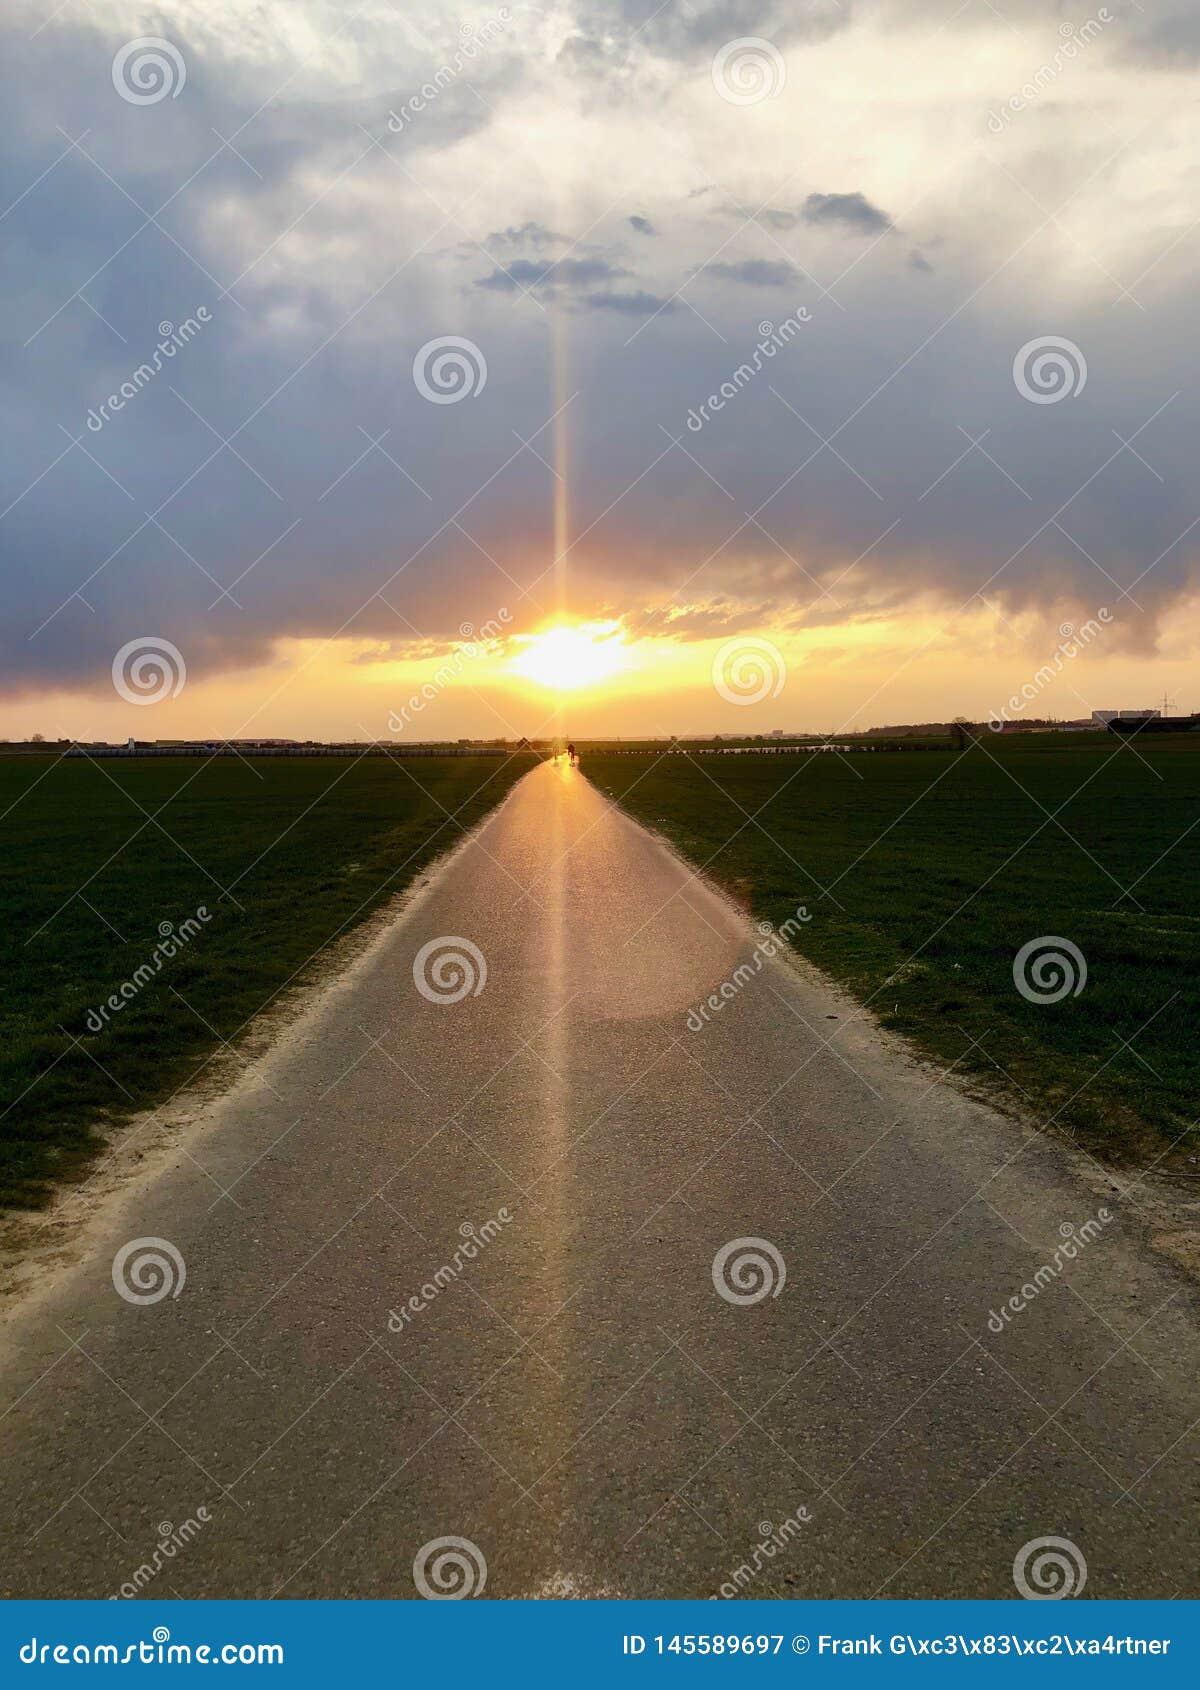 Sunset light above asphalt road